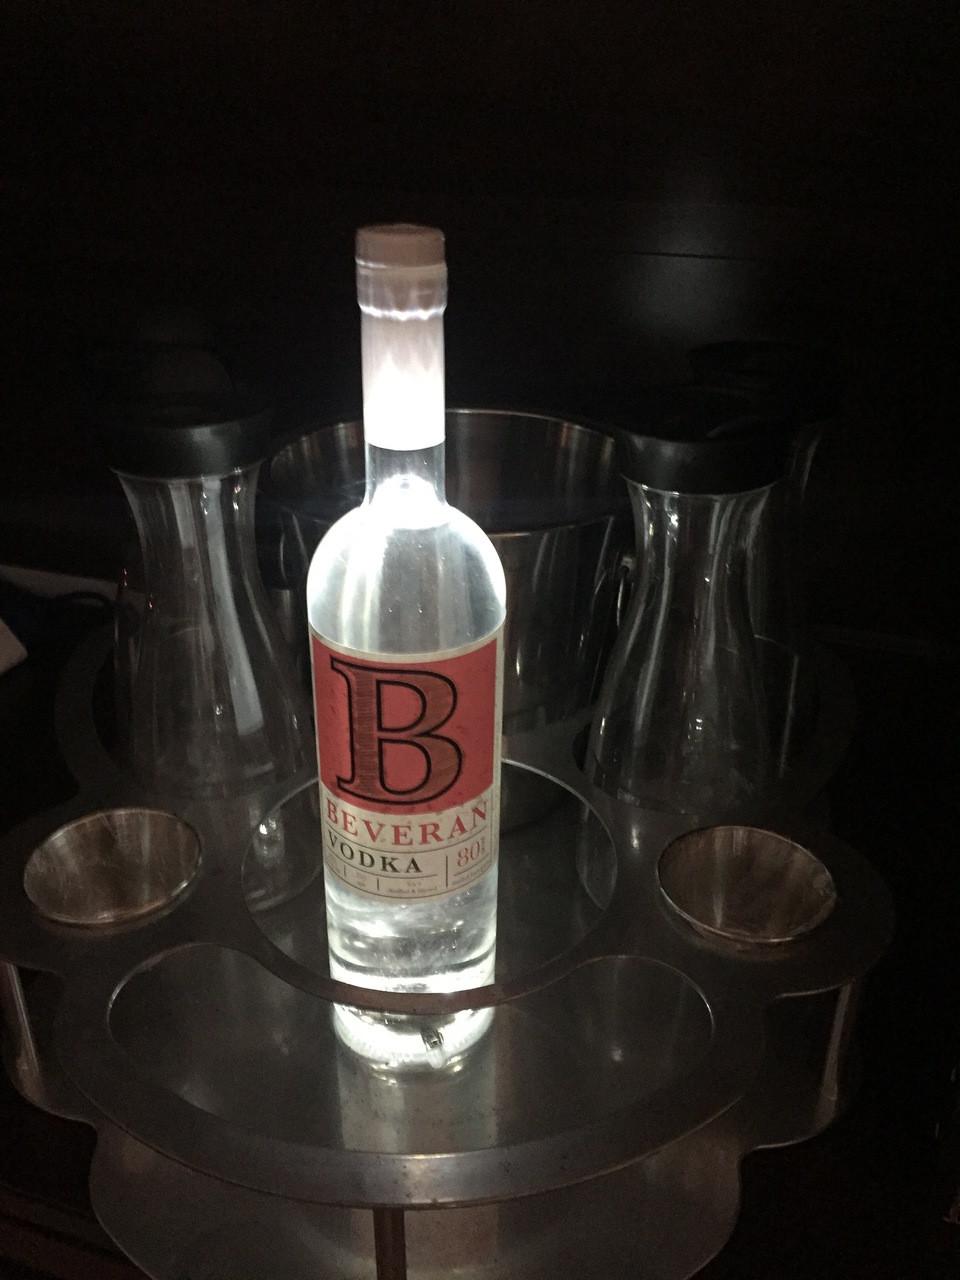 Beveran Vodka, Beveran, Vodka, Light up, Bottle, illuminated Liquor, Light up liquor, Stick on, coaster, Sticker, light,Bottle, Ciroc, Bombay, Bacardi, Vodka, Rum, liquor, Glow, Bottle, Glorifier,